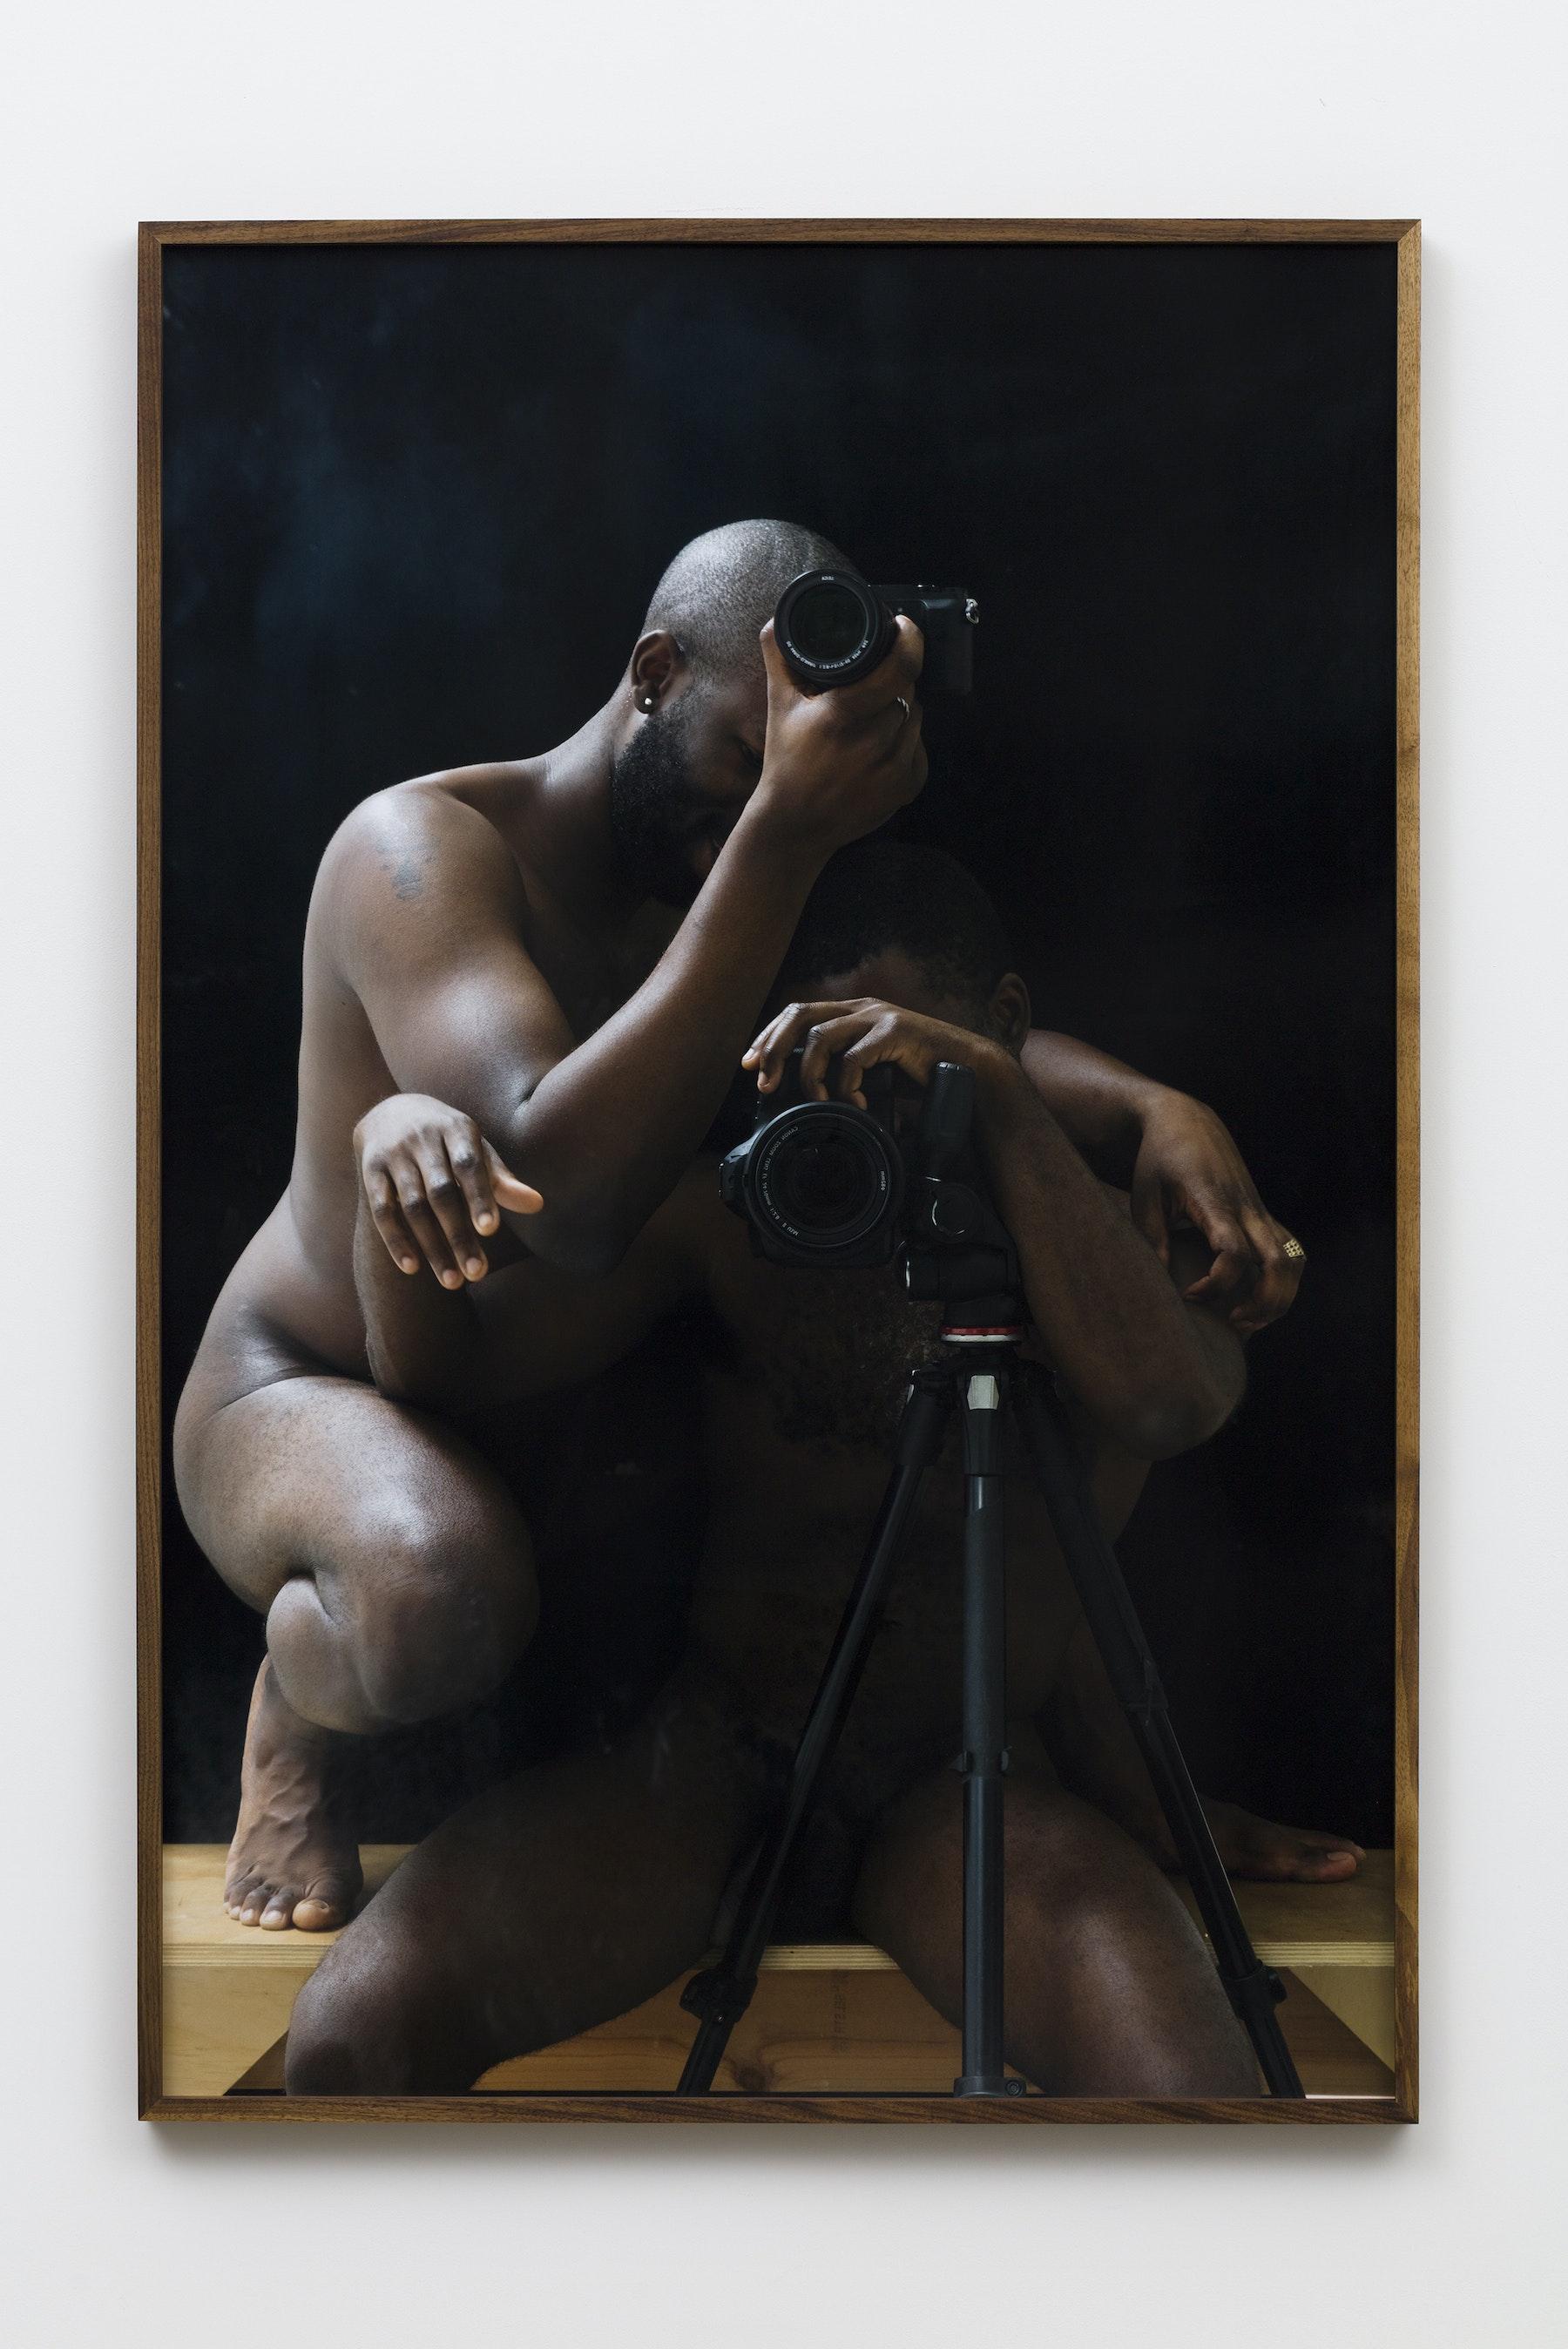 "Paul Mpagi Sepuya ""Darkroom Mirror (0X5A0721),"" 2019 Archival pigment print 60 x 40"" [HxW] (152.4 x 101.6 cm) Edition of 5, 2 AP Inventory #SEP649 Courtesy of the artist and Vielmetter Los Angeles Photo credit: Jeff McLane"